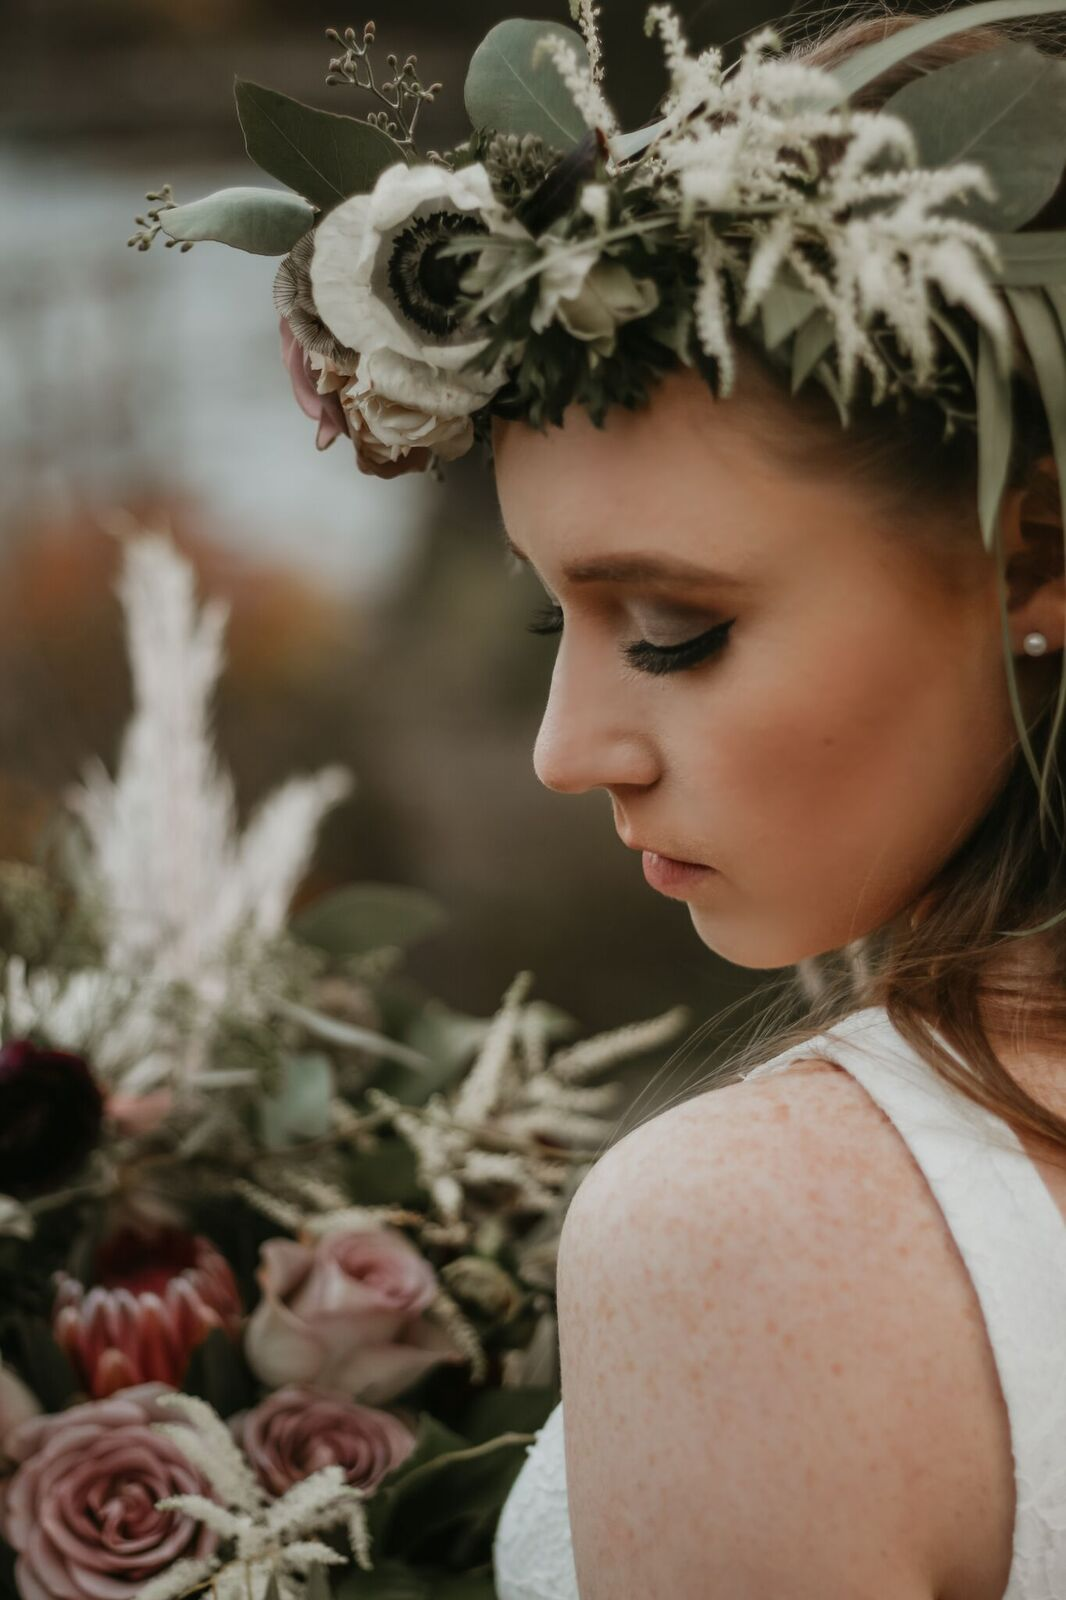 spokane river wedding photo shoot image5